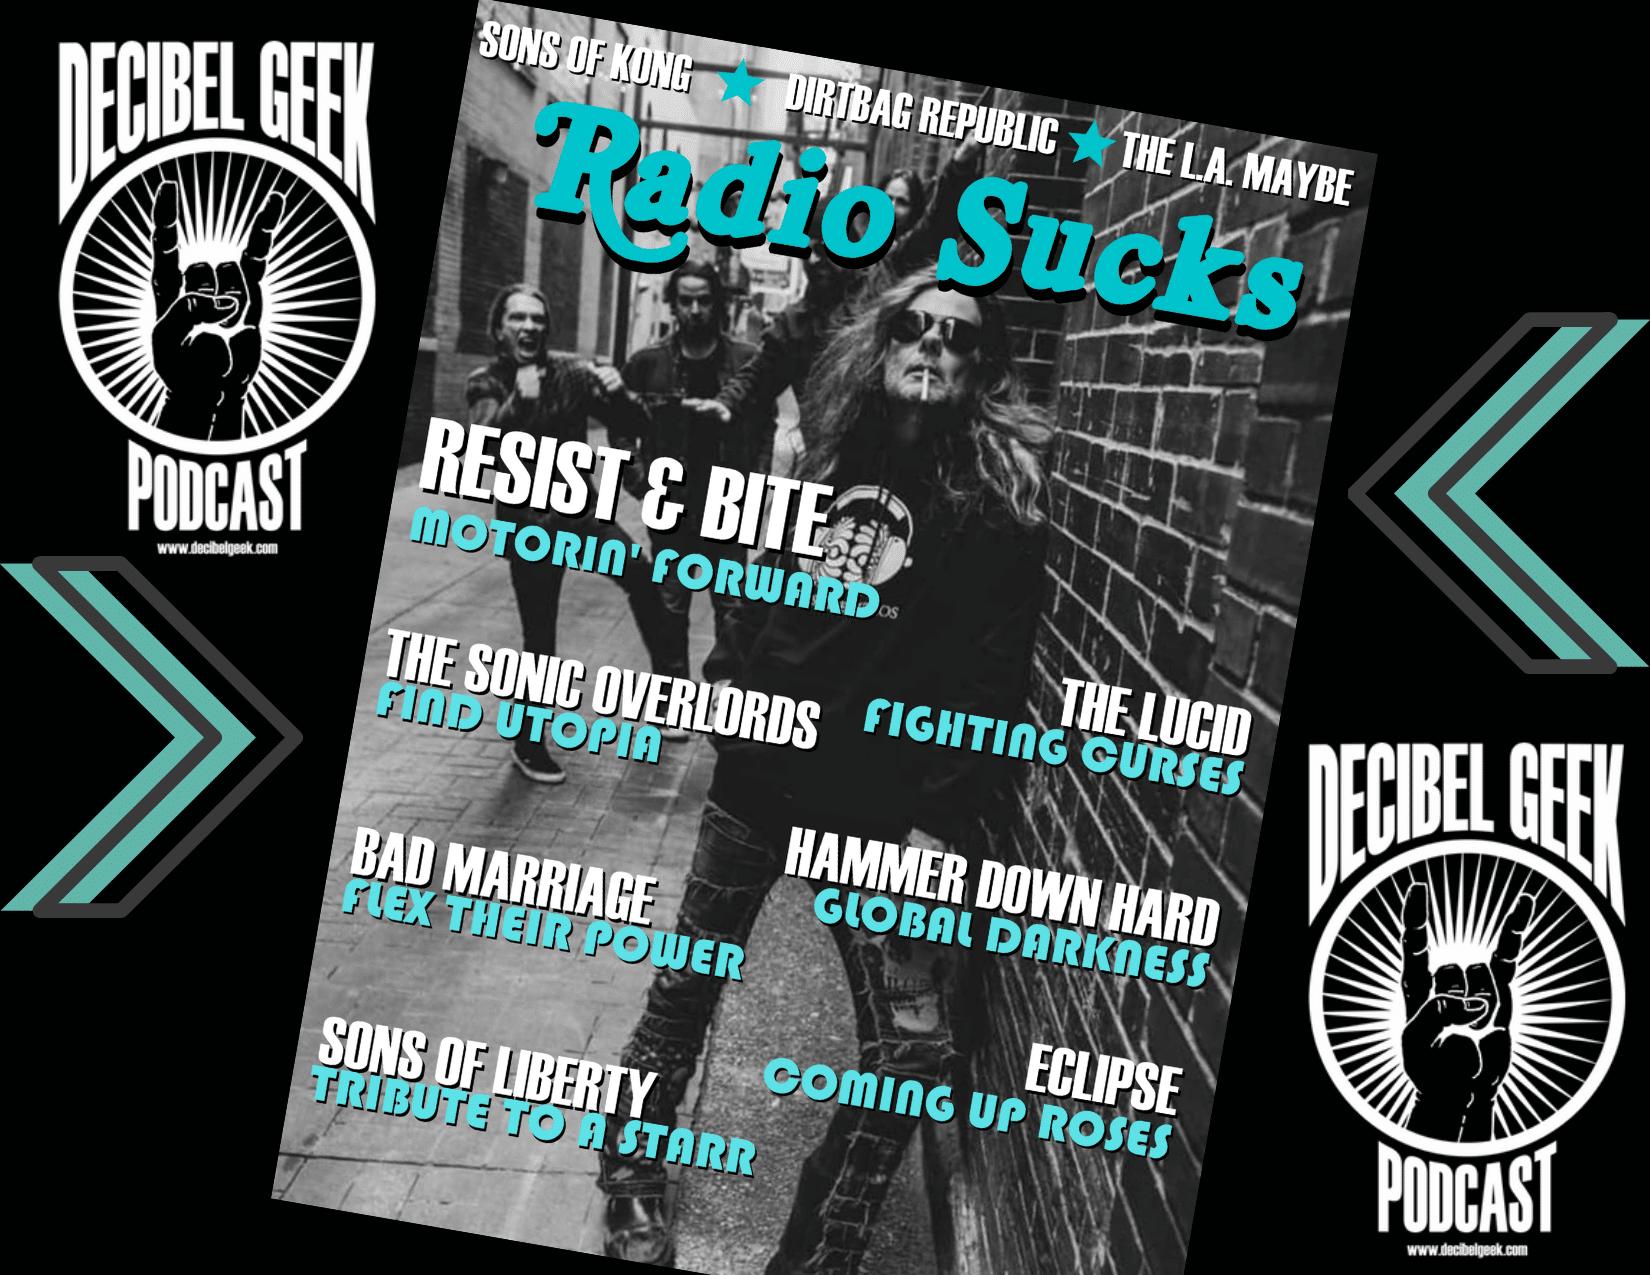 radio sucks, decibel geek, podcast, rock, metal, new